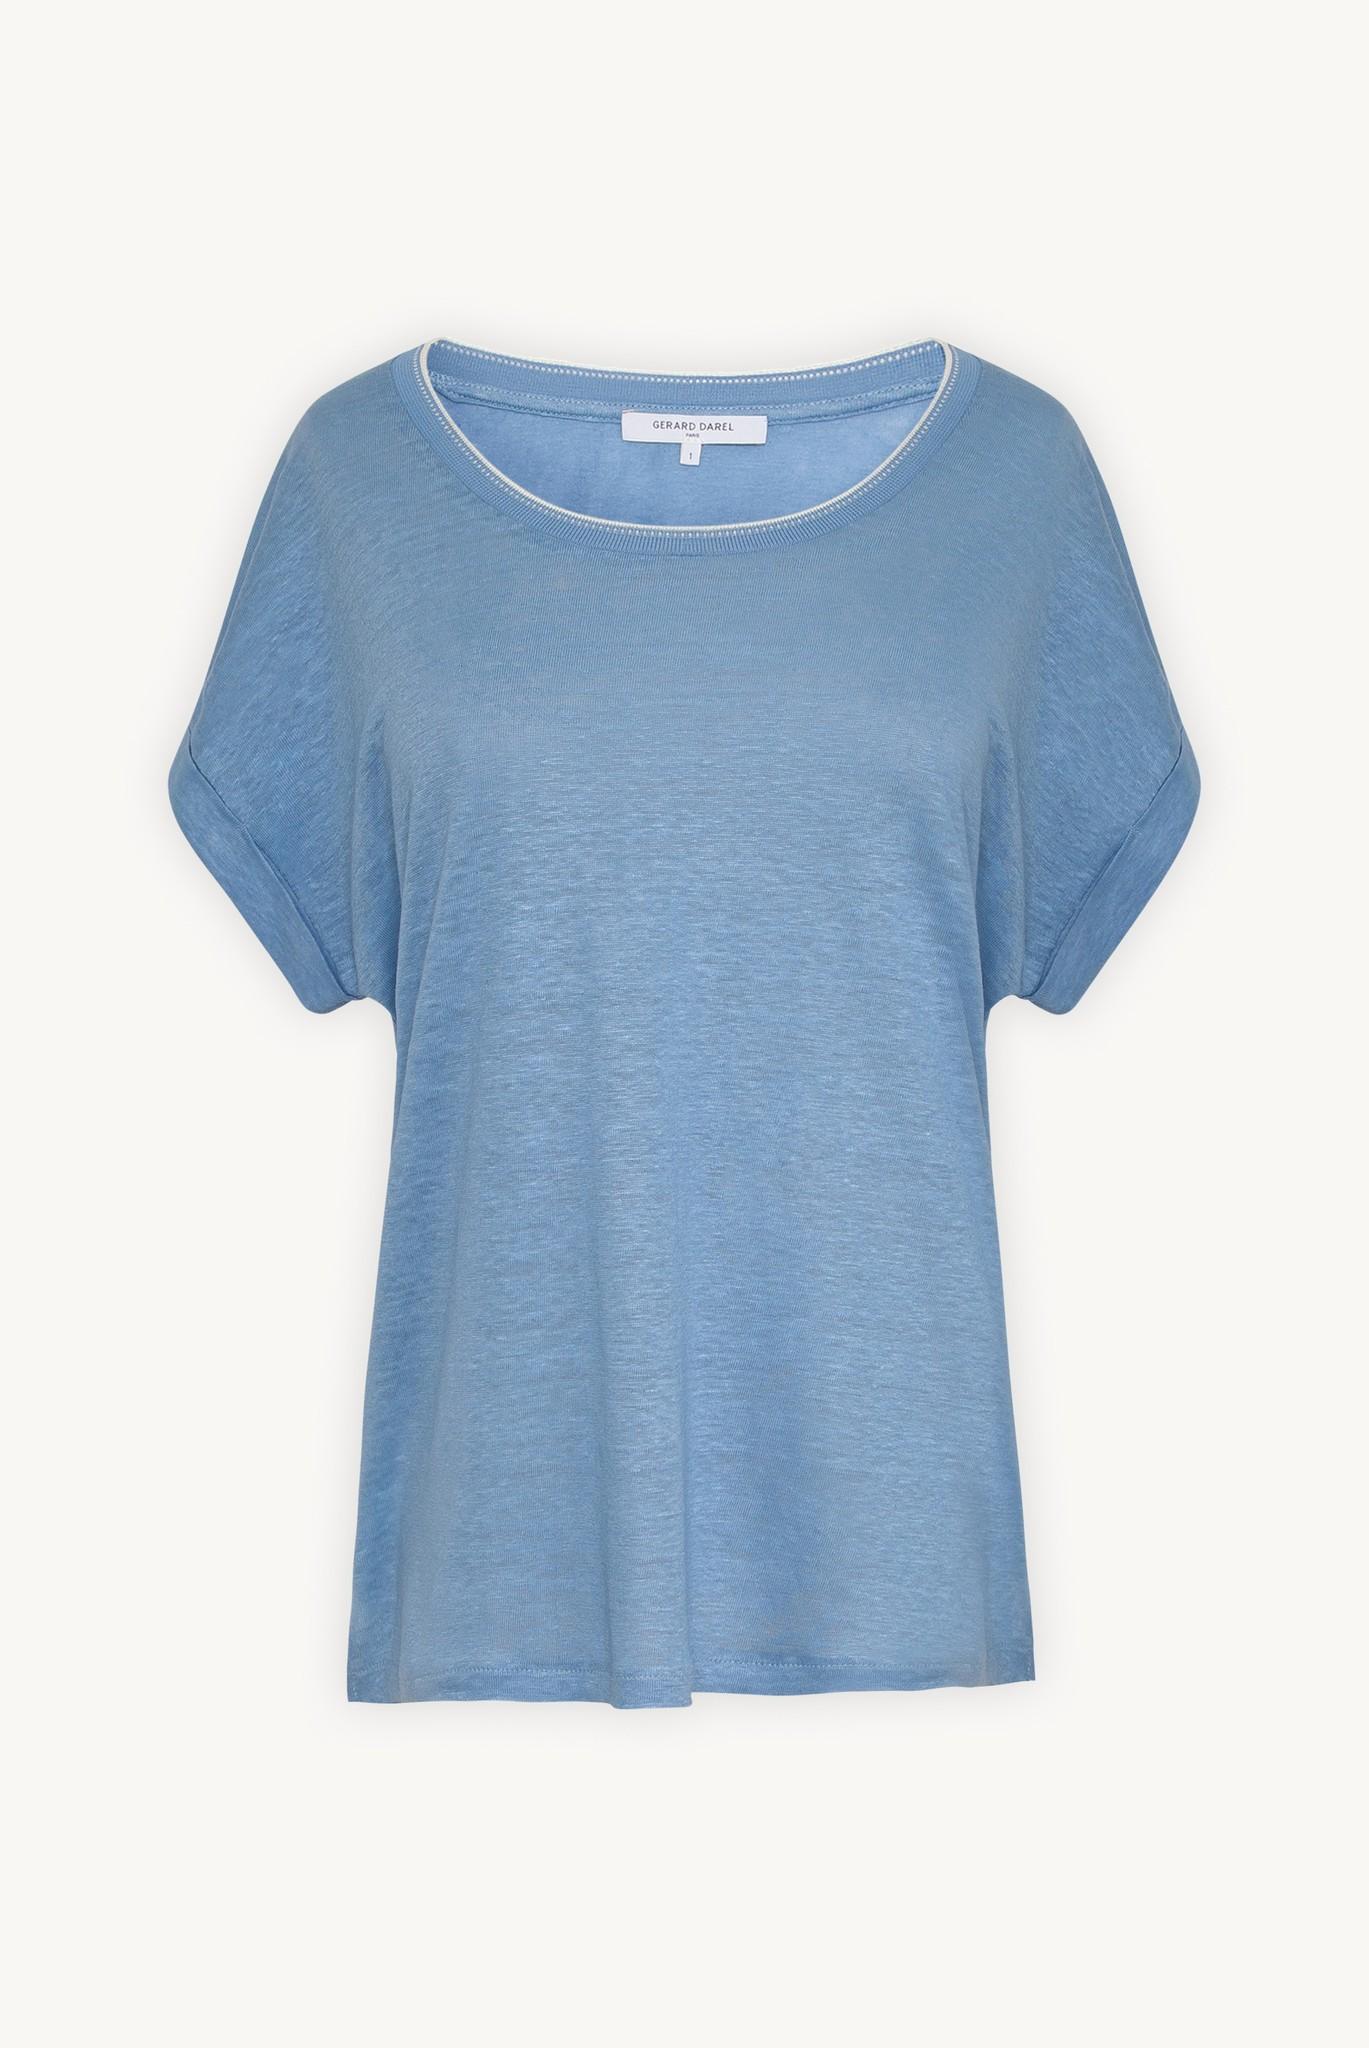 JEMMA - льняная футболка oversize